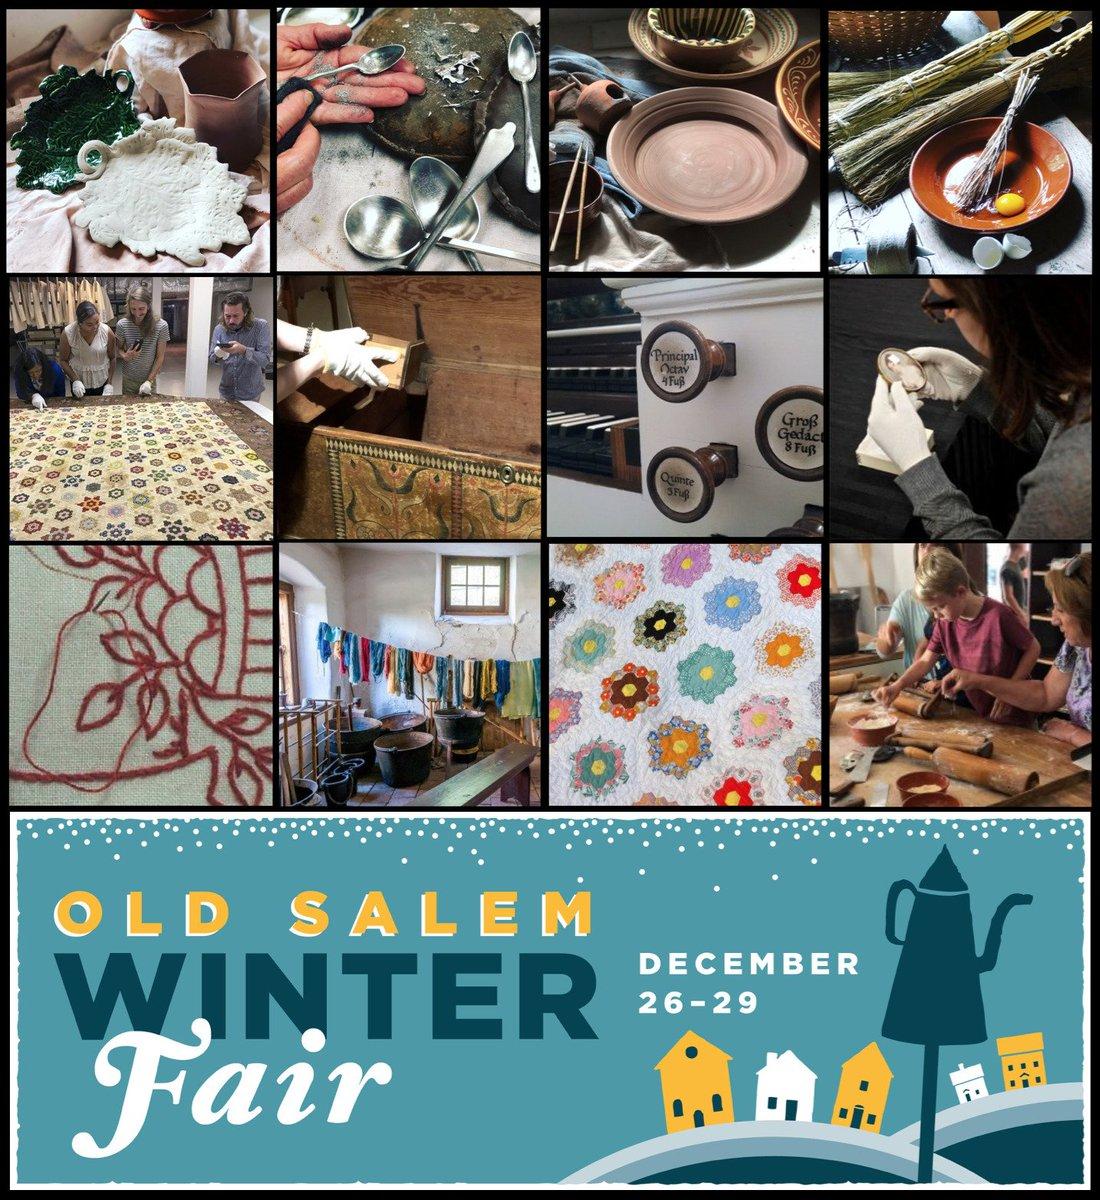 Old Salem Museum (@OldSalemInc) | Twitter